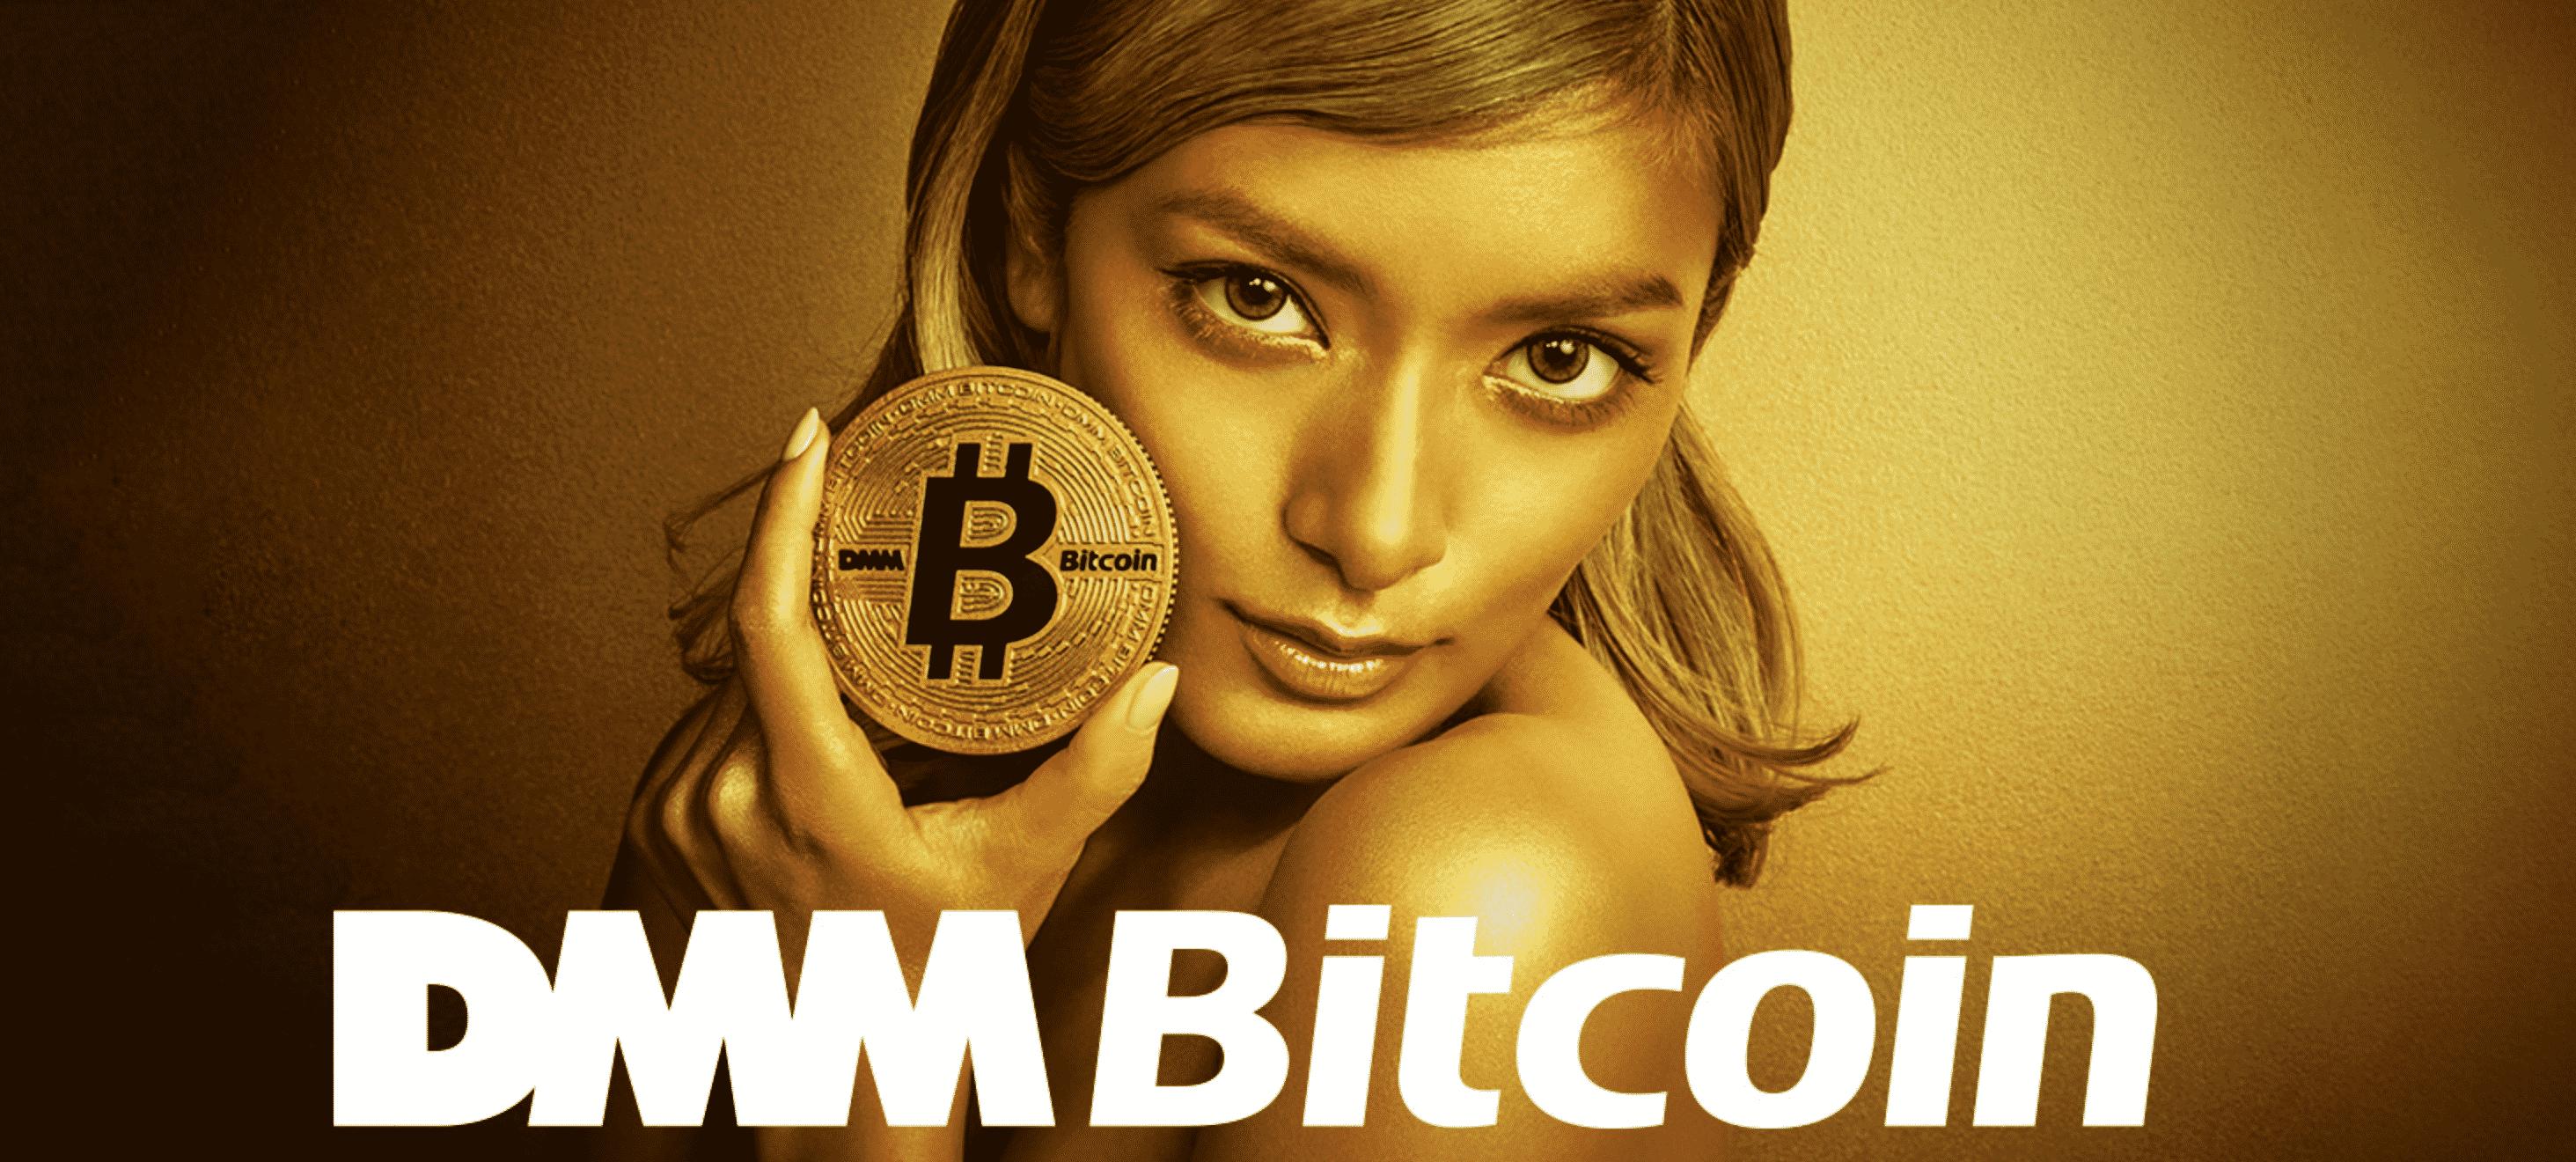 DMM Bitcoin DMMビットコイン 特徴